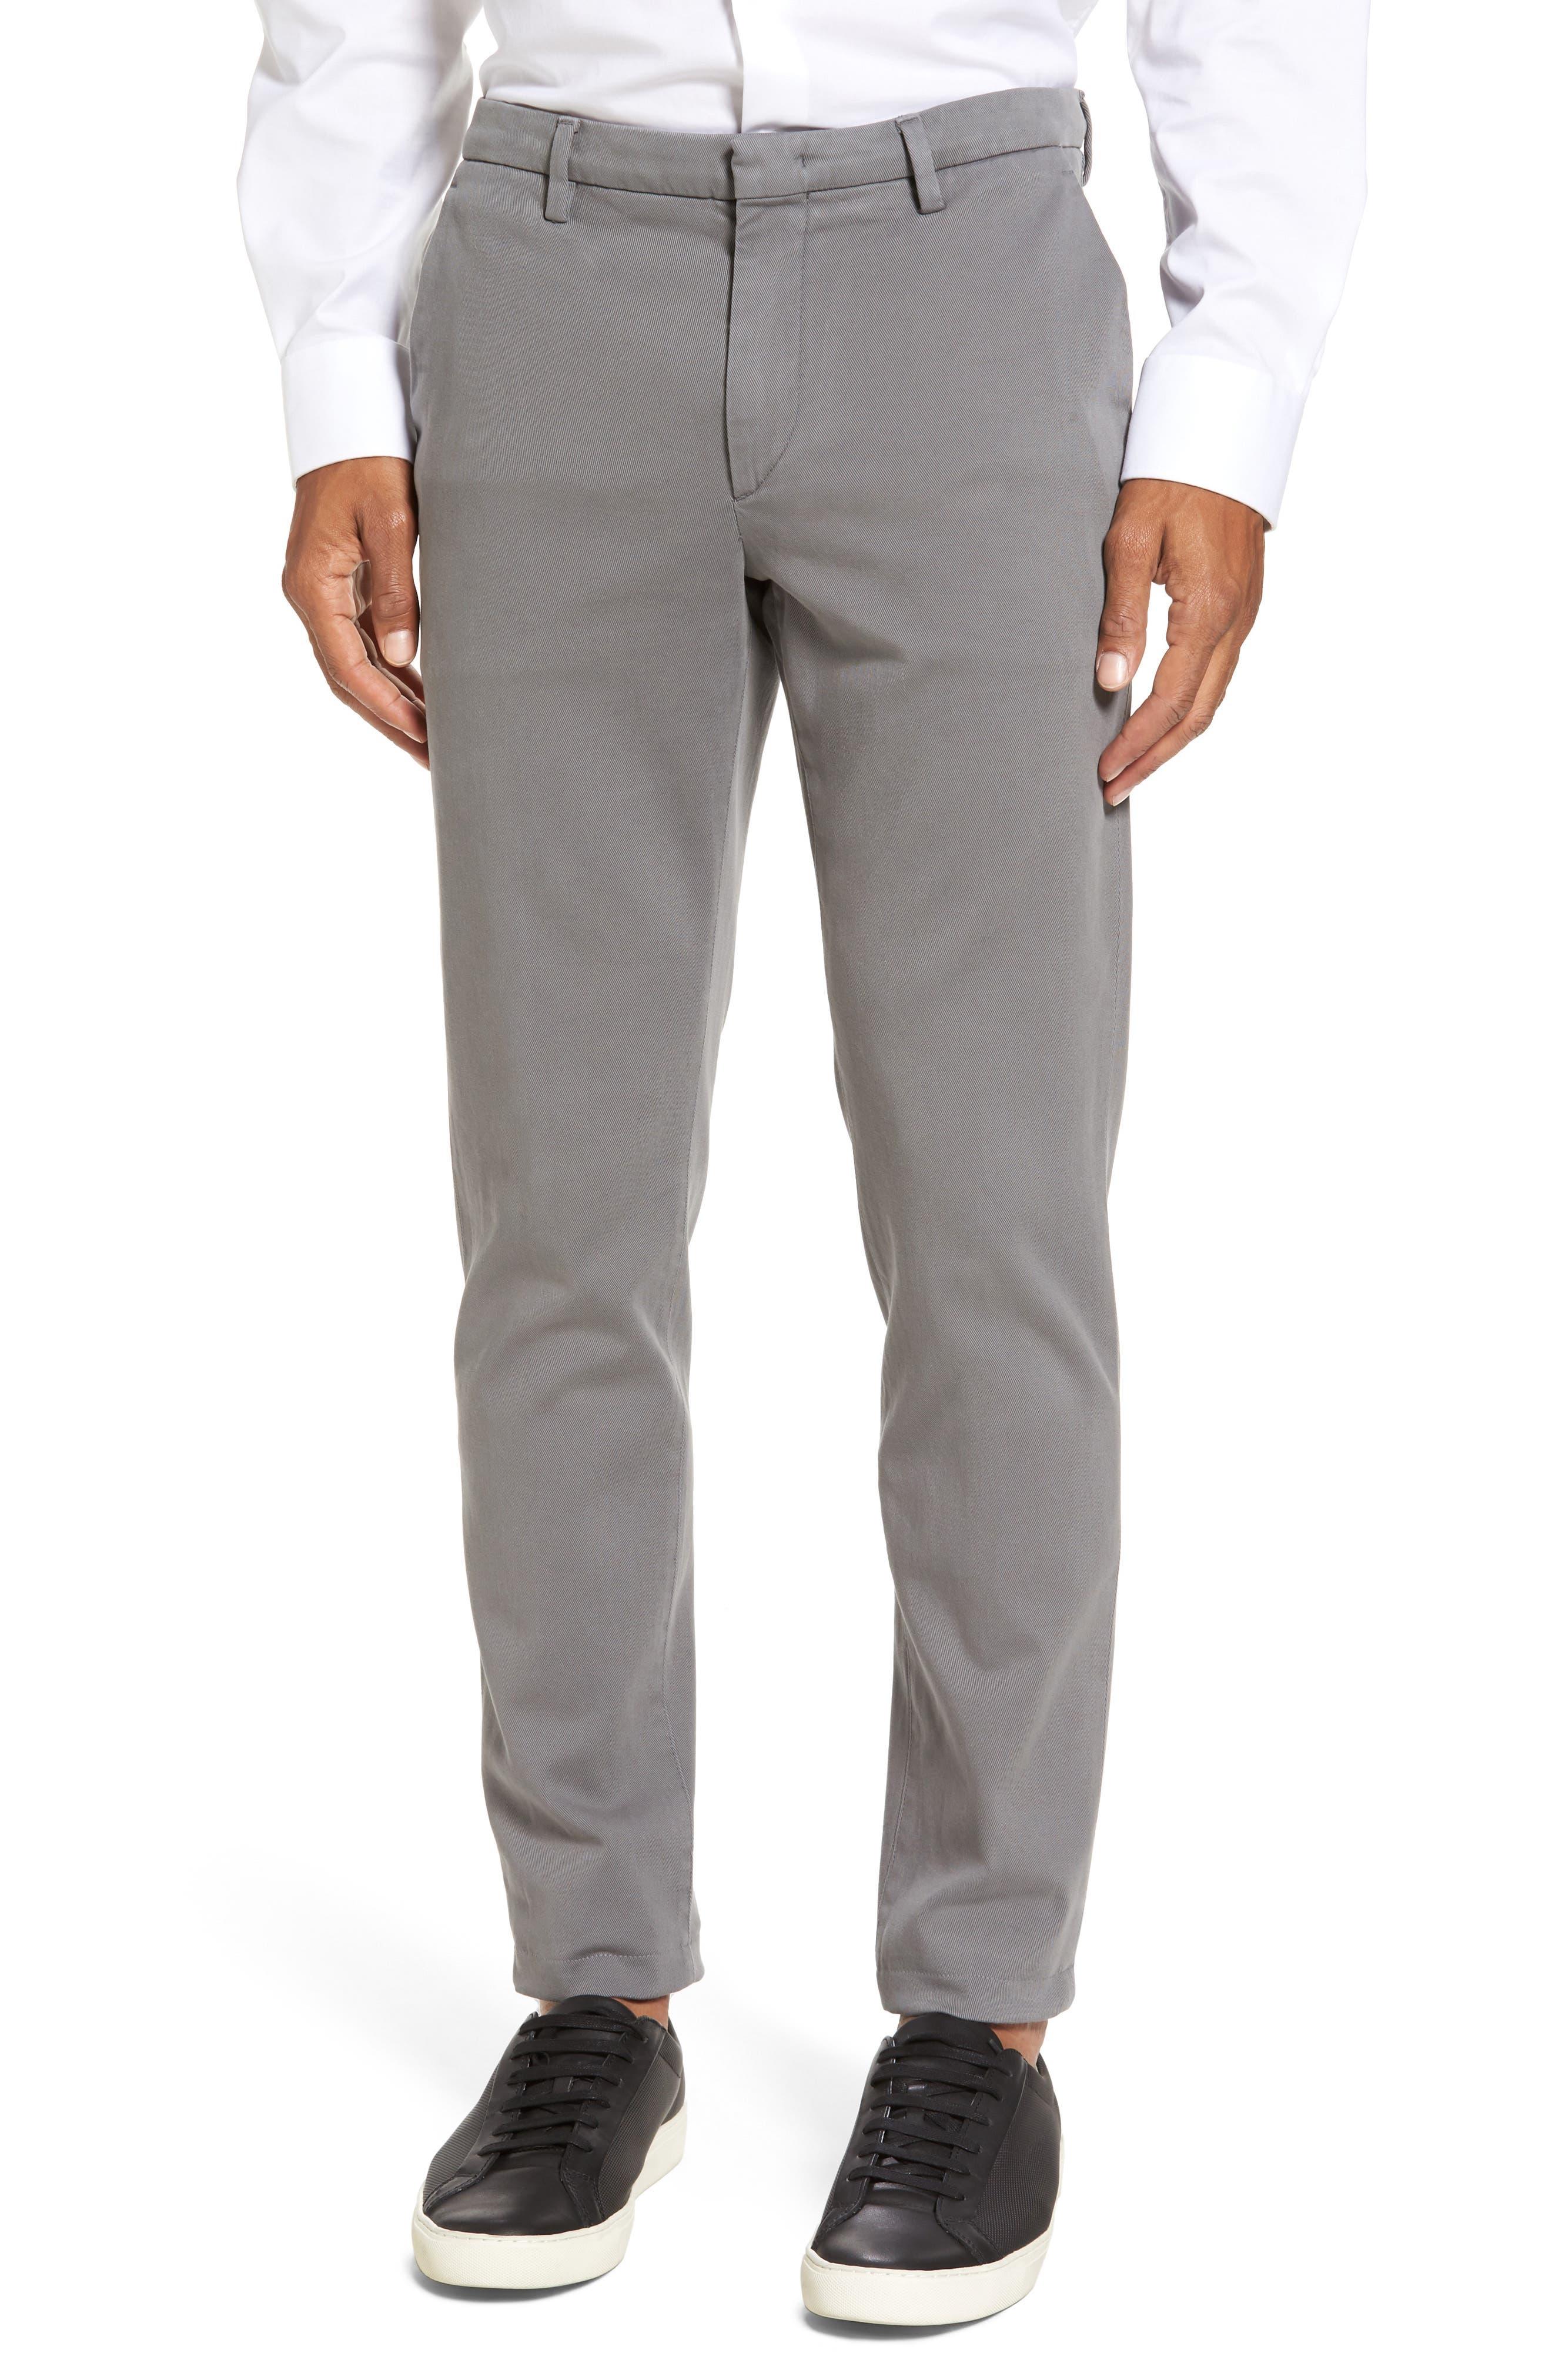 Kaito Stretch Chino Pants,                         Main,                         color, 069